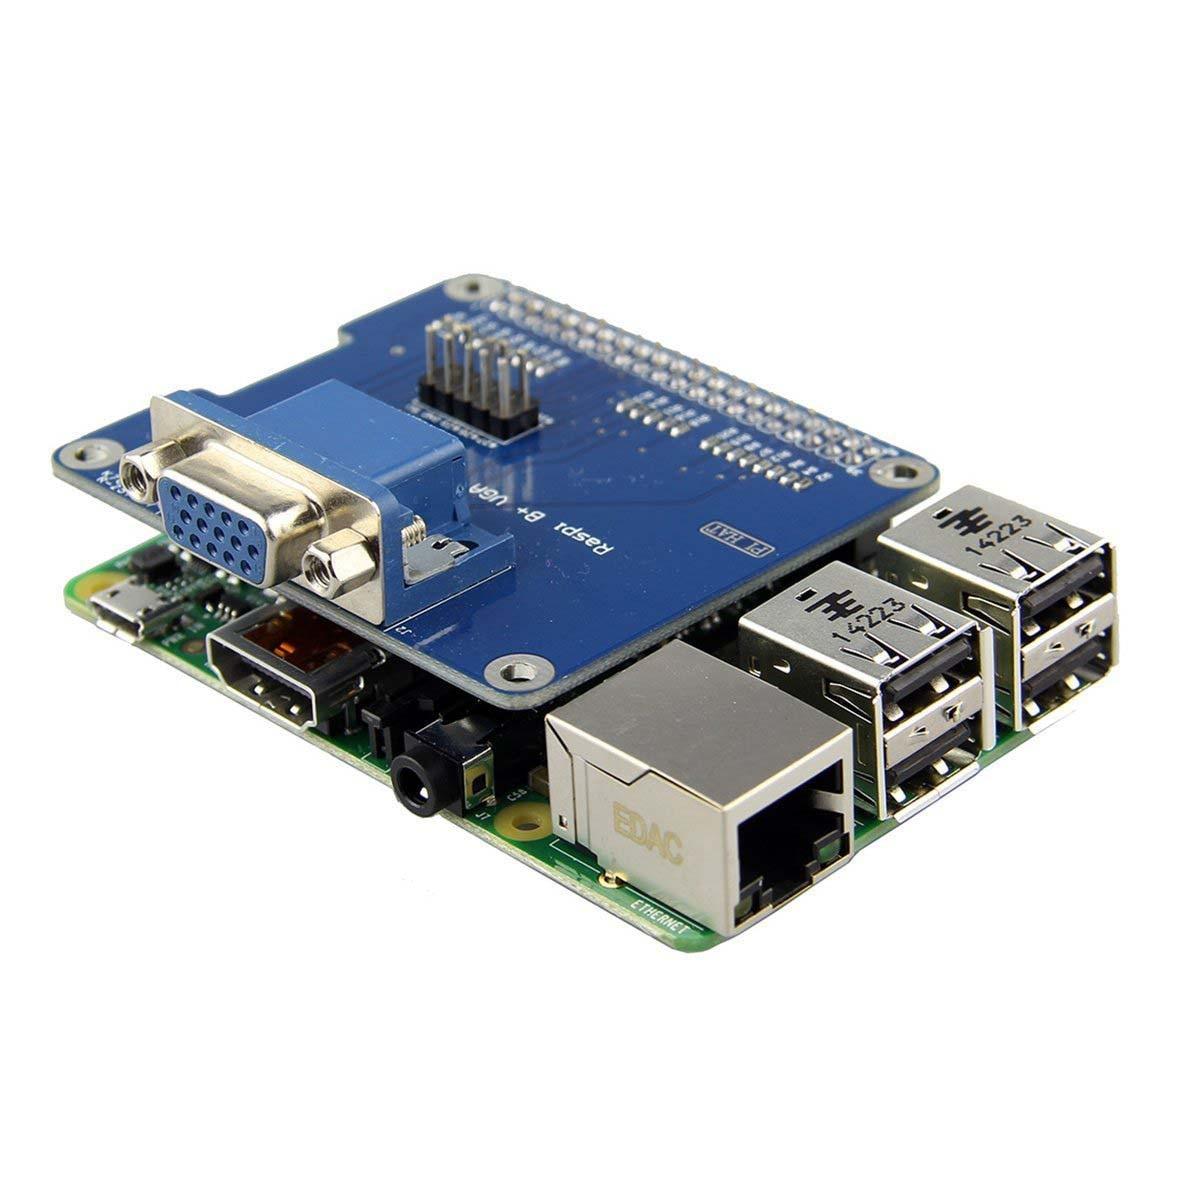 VGA щит V2.0 Плата расширения для Raspberry Pi 3B/2B/B +/A +/VGA щит v2.0 Плата расширения продлить интерфейсом VGA через GPIO ...